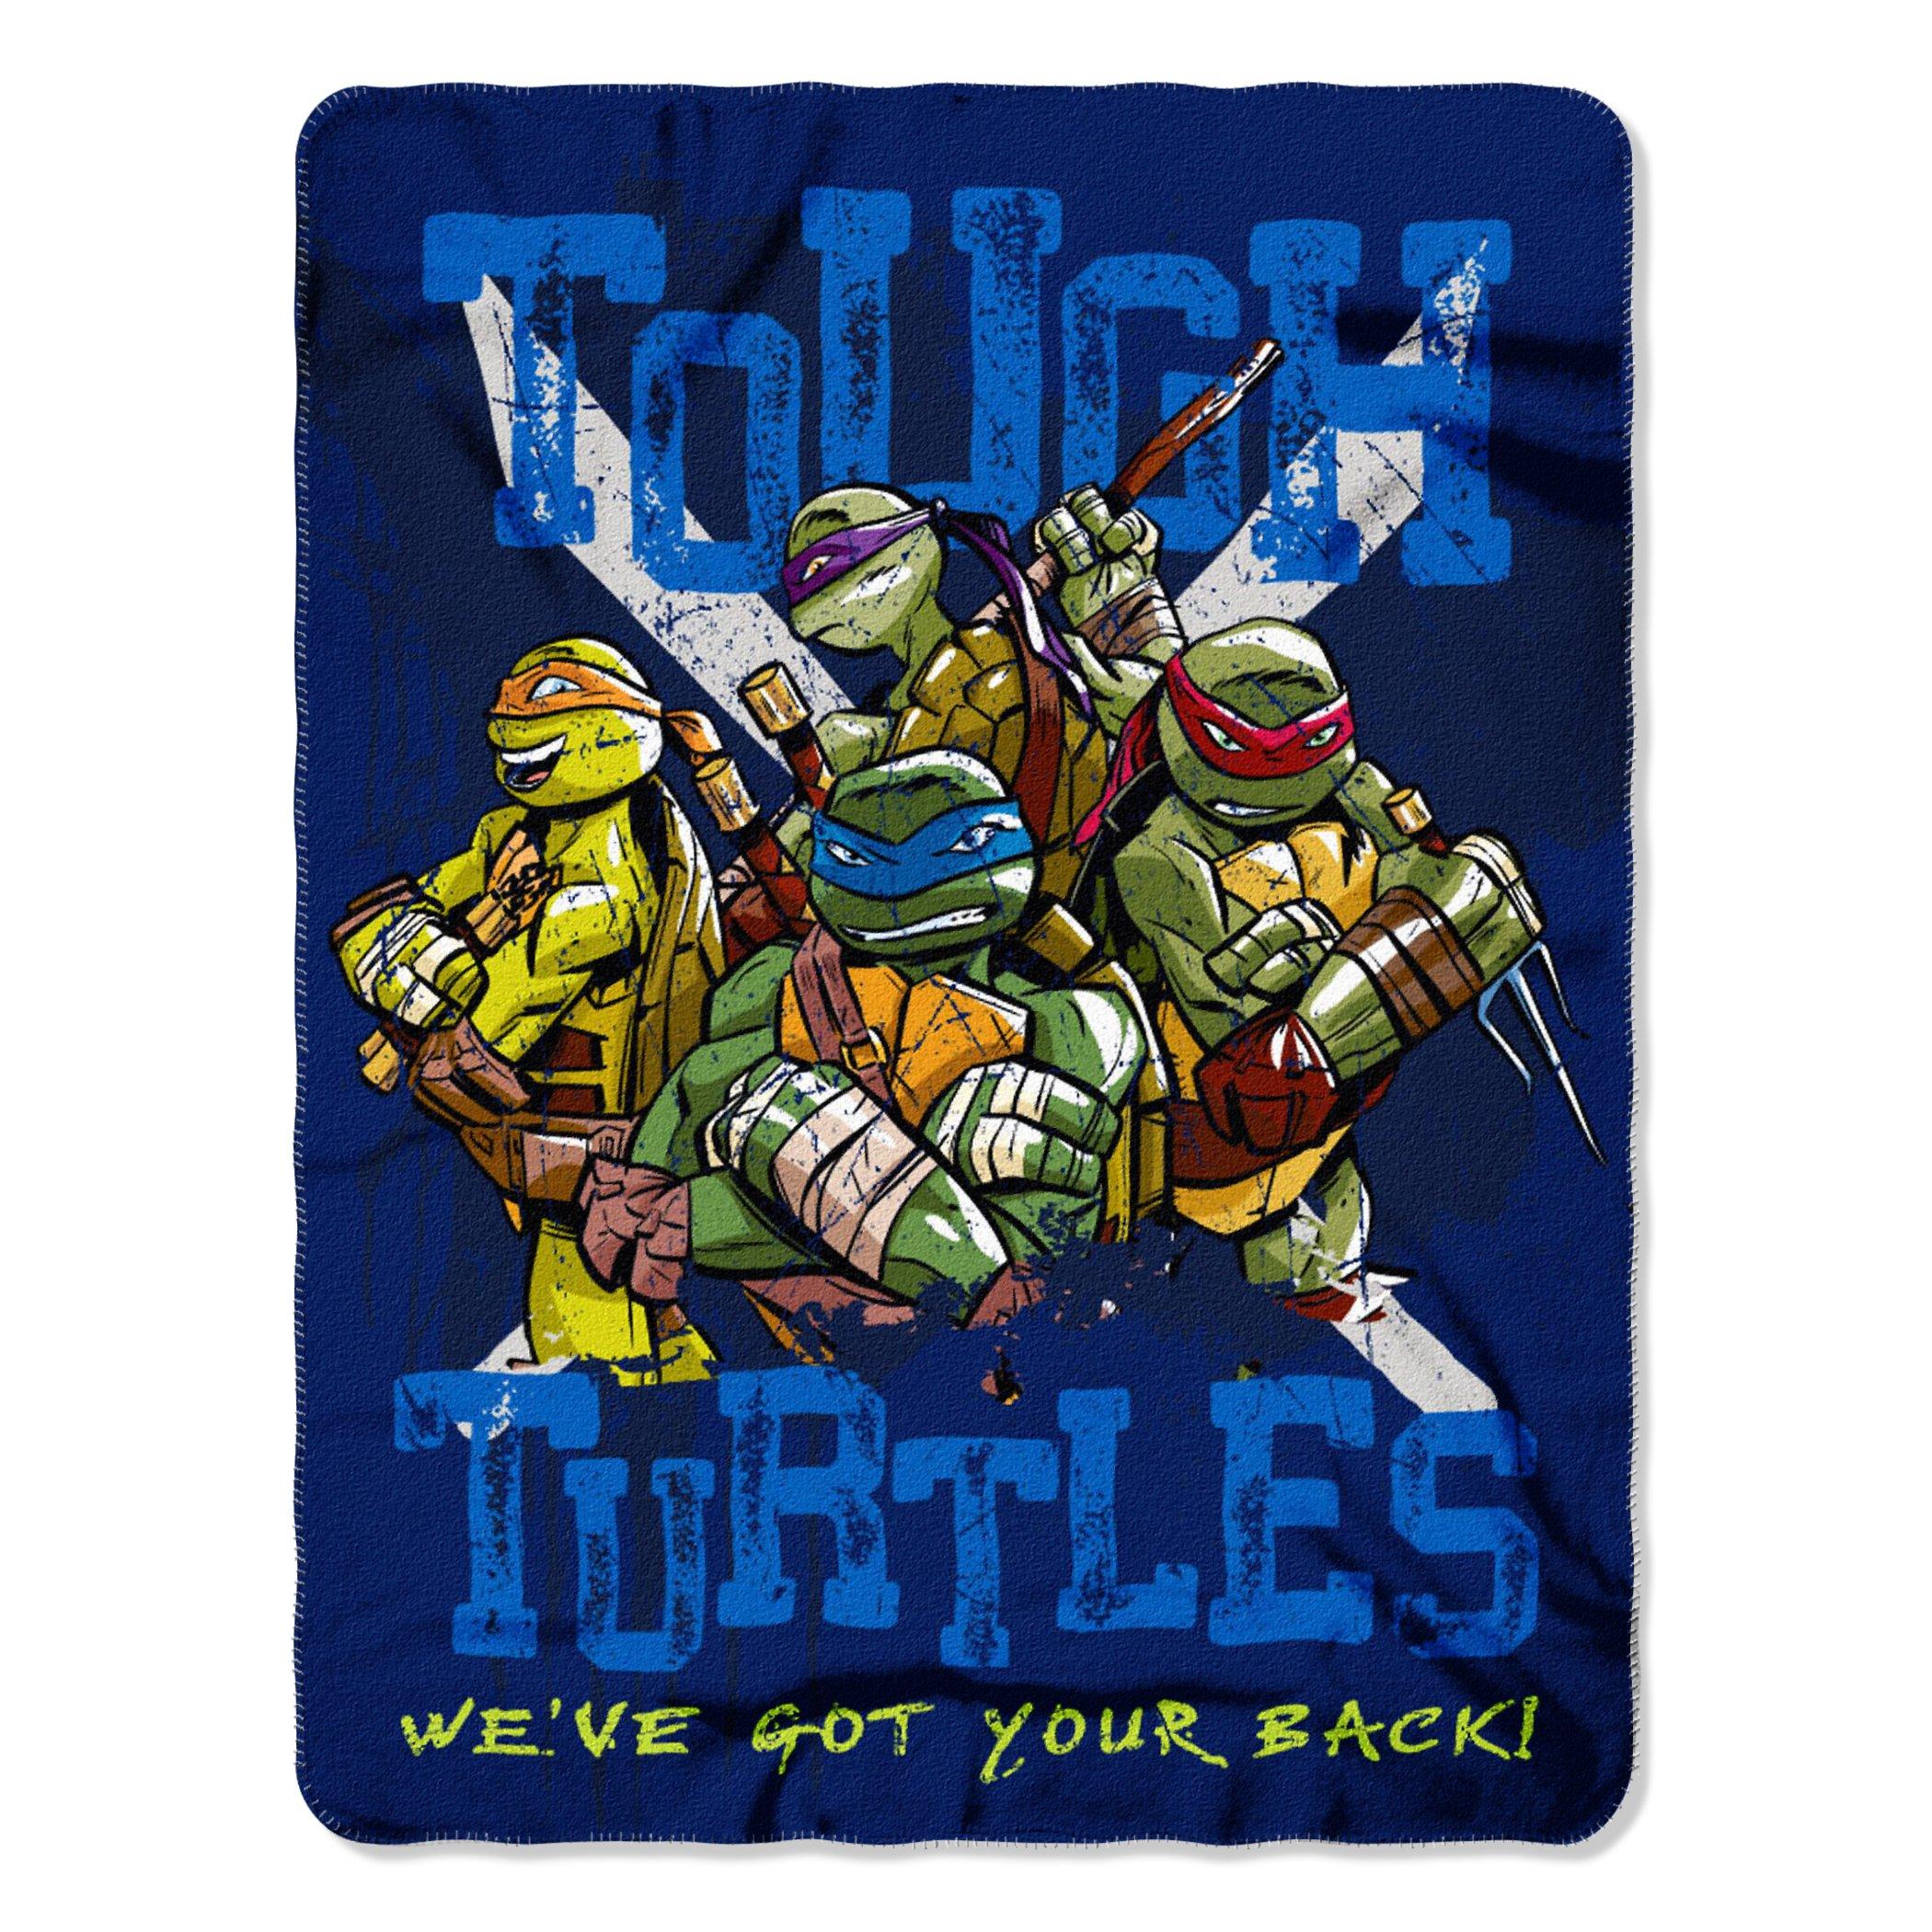 "Nickelodeon Teenage Mutant Ninja Turtles, Tough Turtles Blues Fleece Throw Blanket, 45"" x 60"", Multi Color"